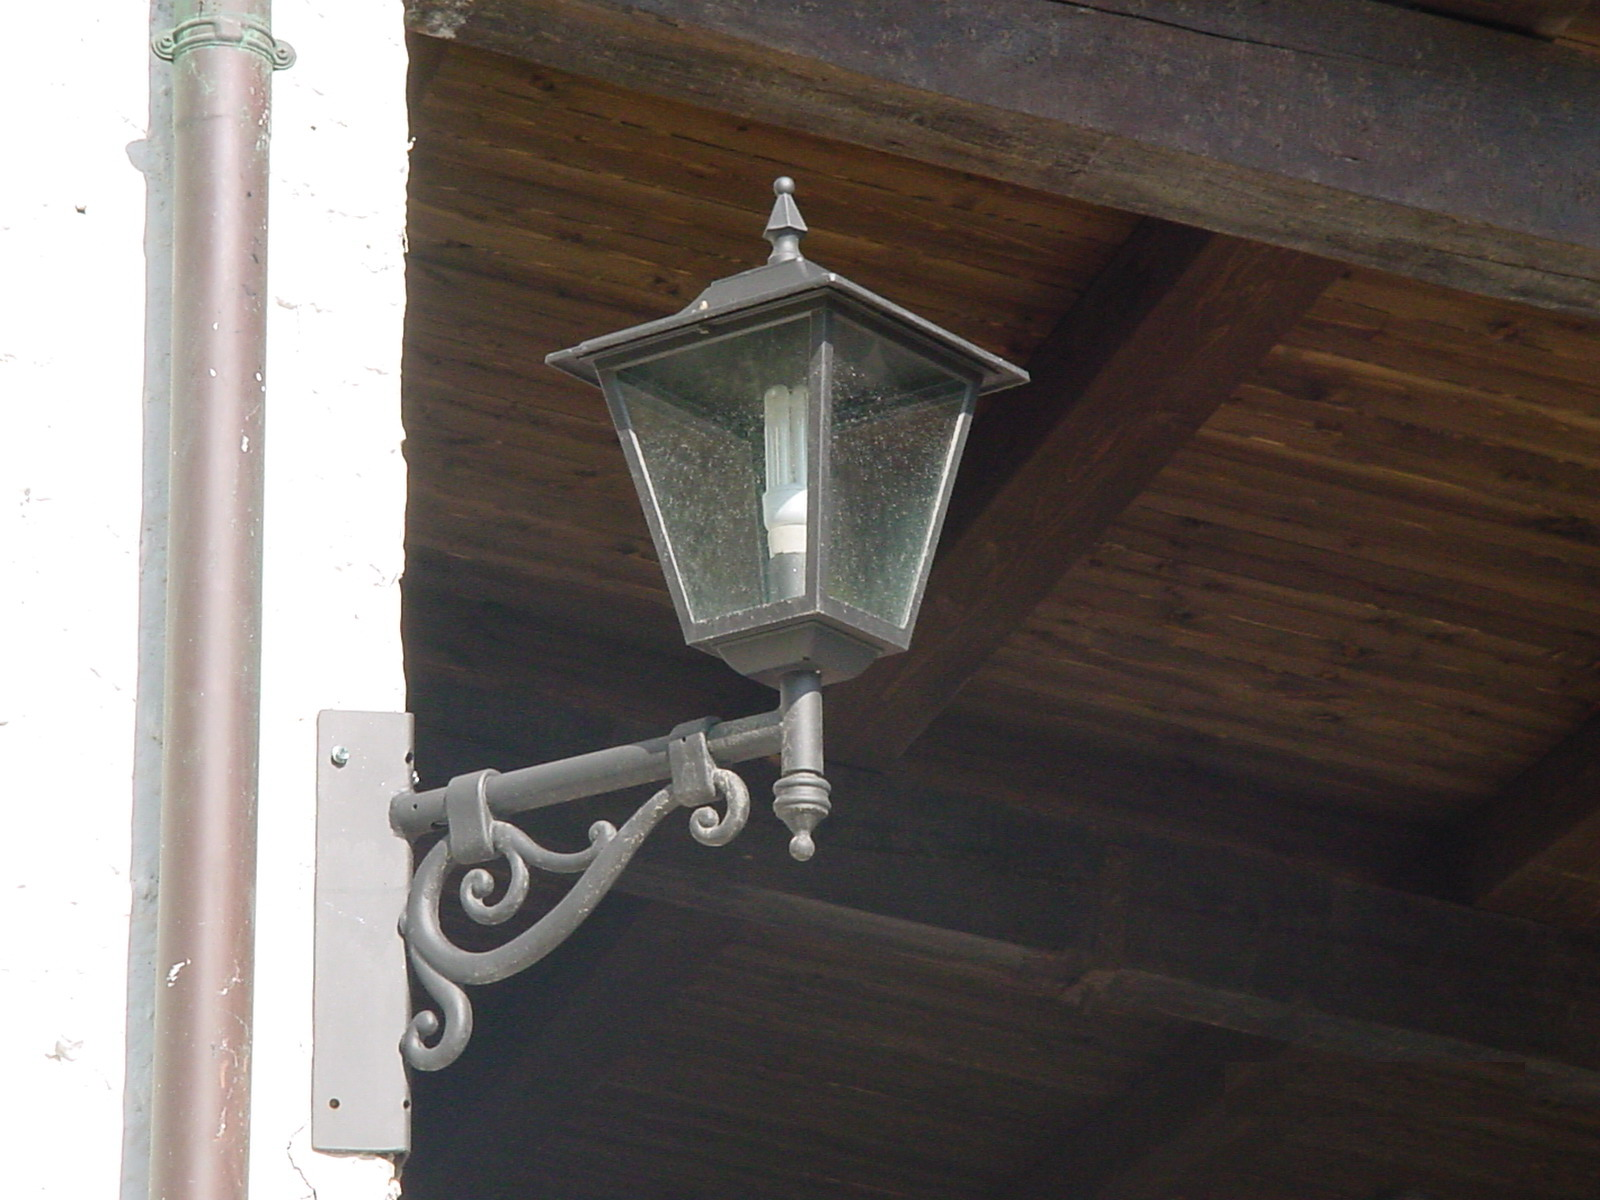 Lanterna Parete Esterno : Lanterna a muro esterno mezza lanterna da parete applique per